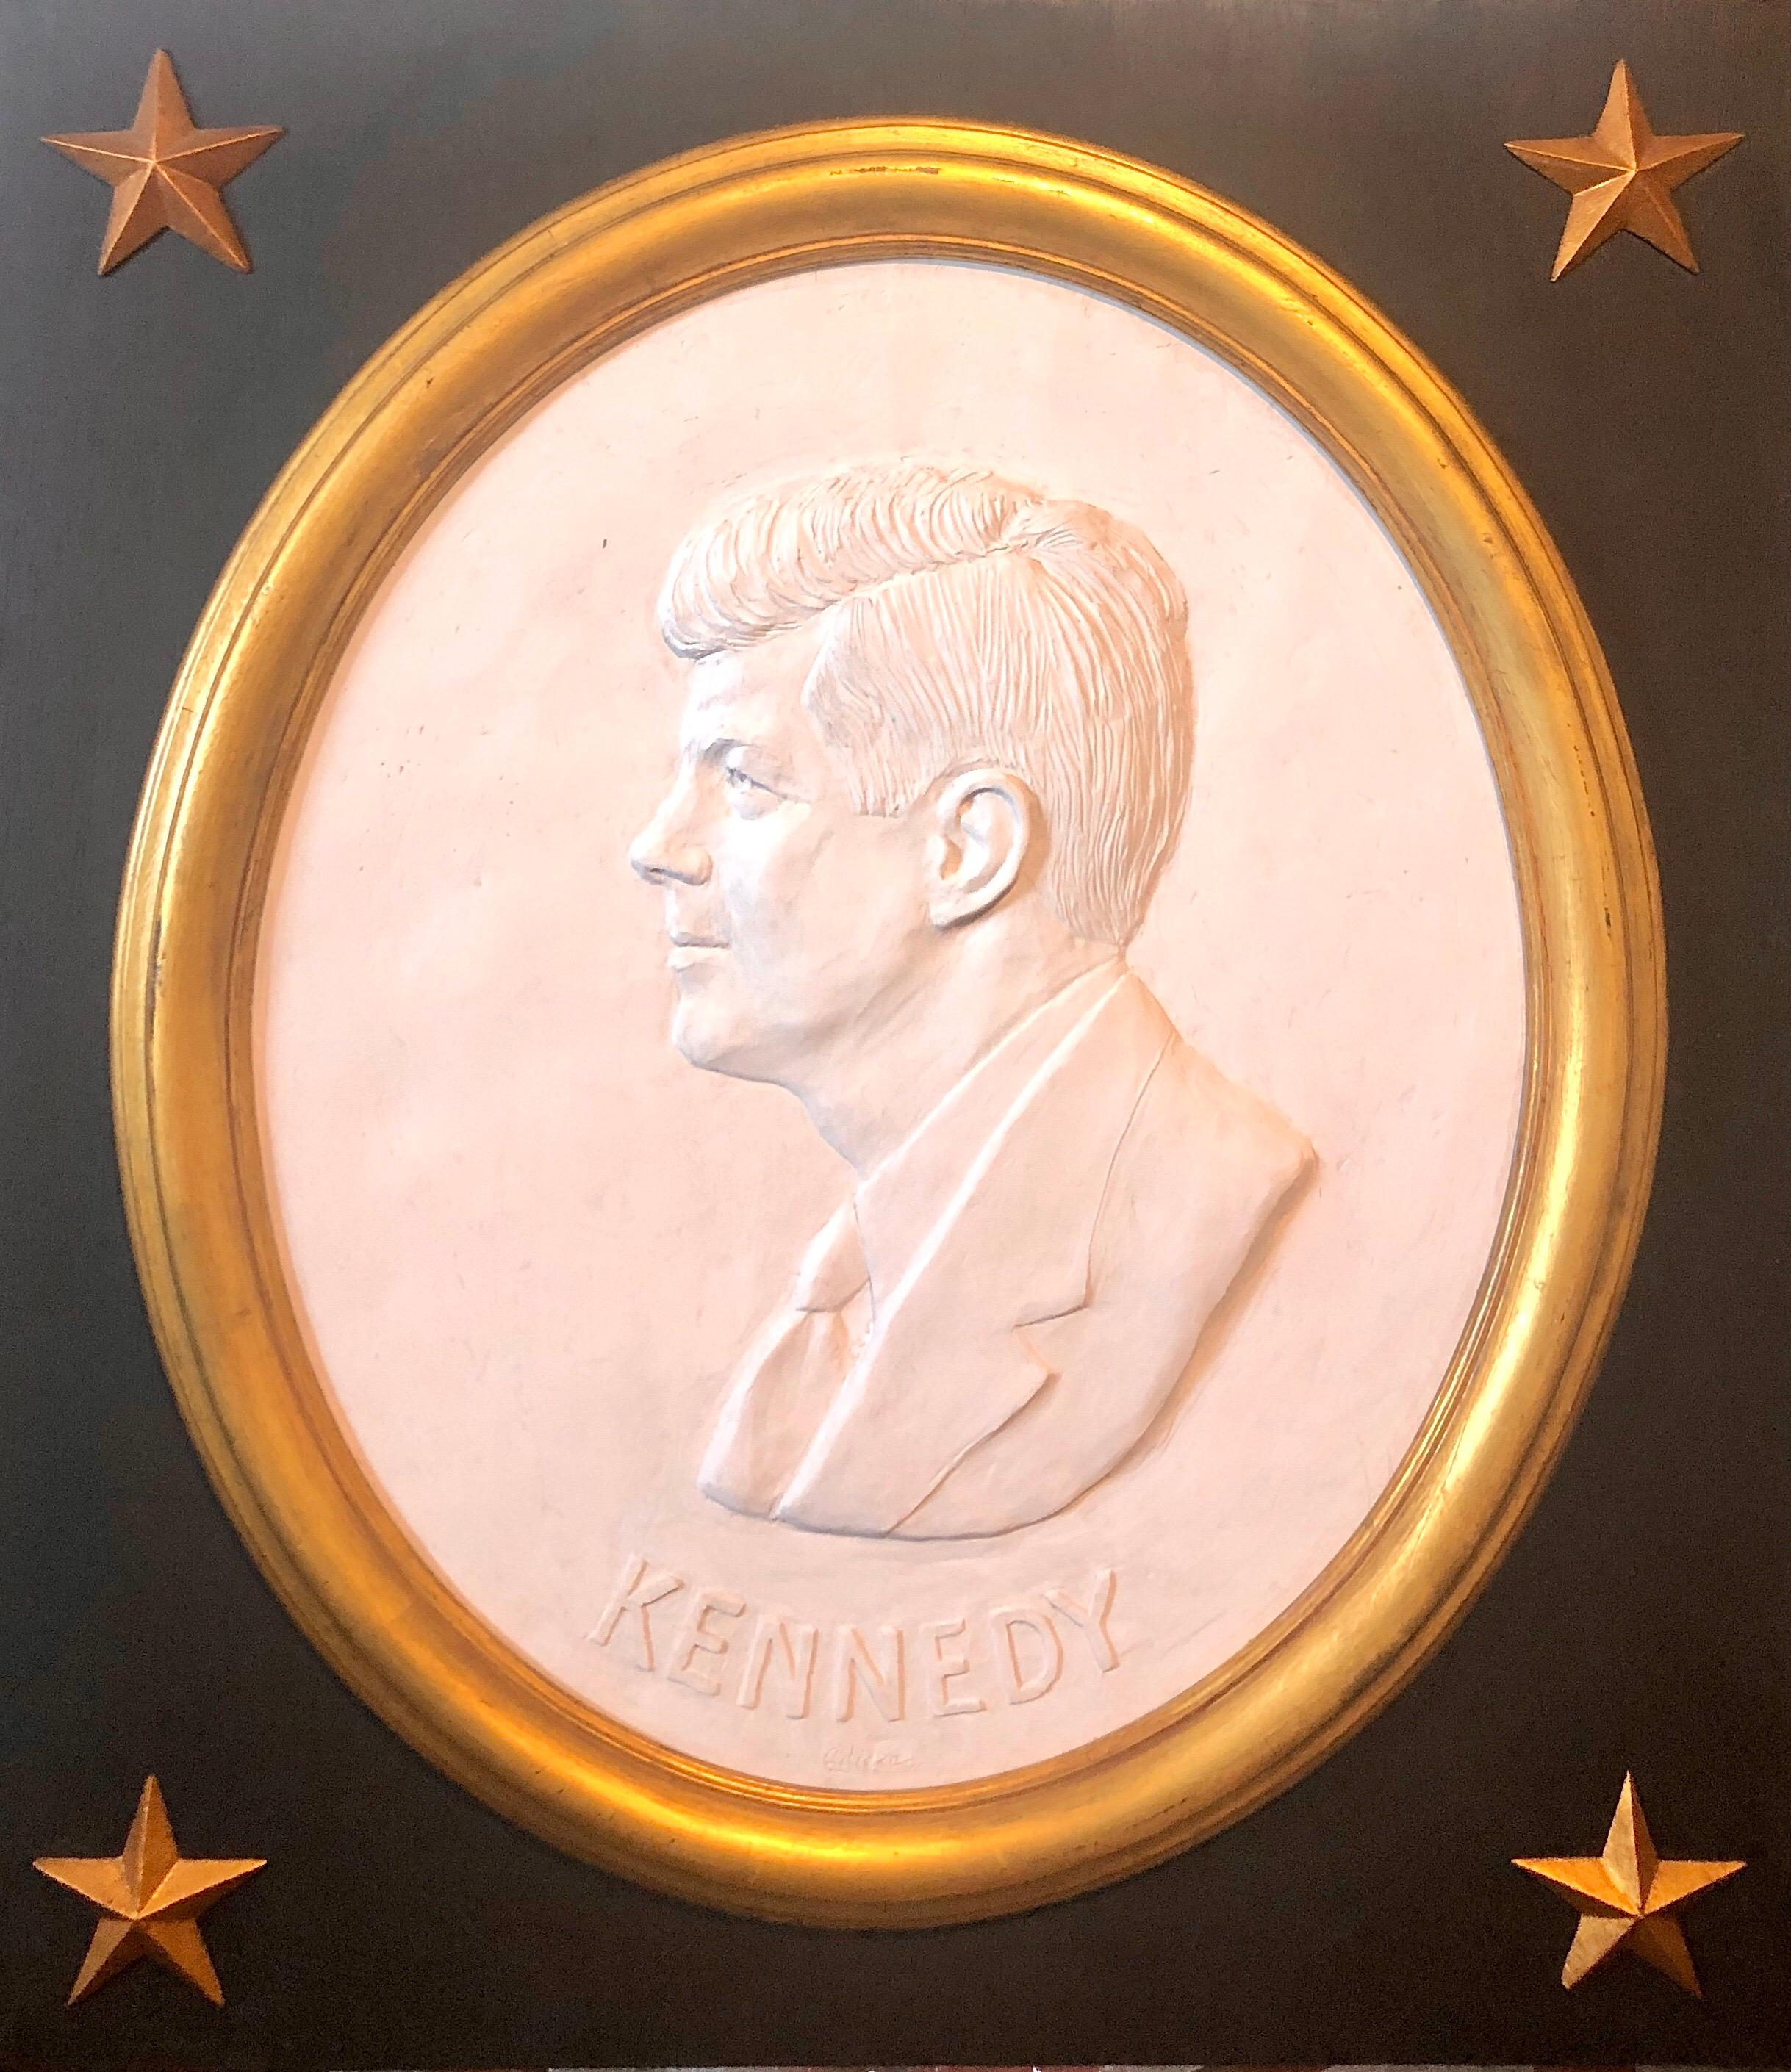 Texas Artist David Pryor Adickes John F Kennedy Bas Relief Painted Sculpture